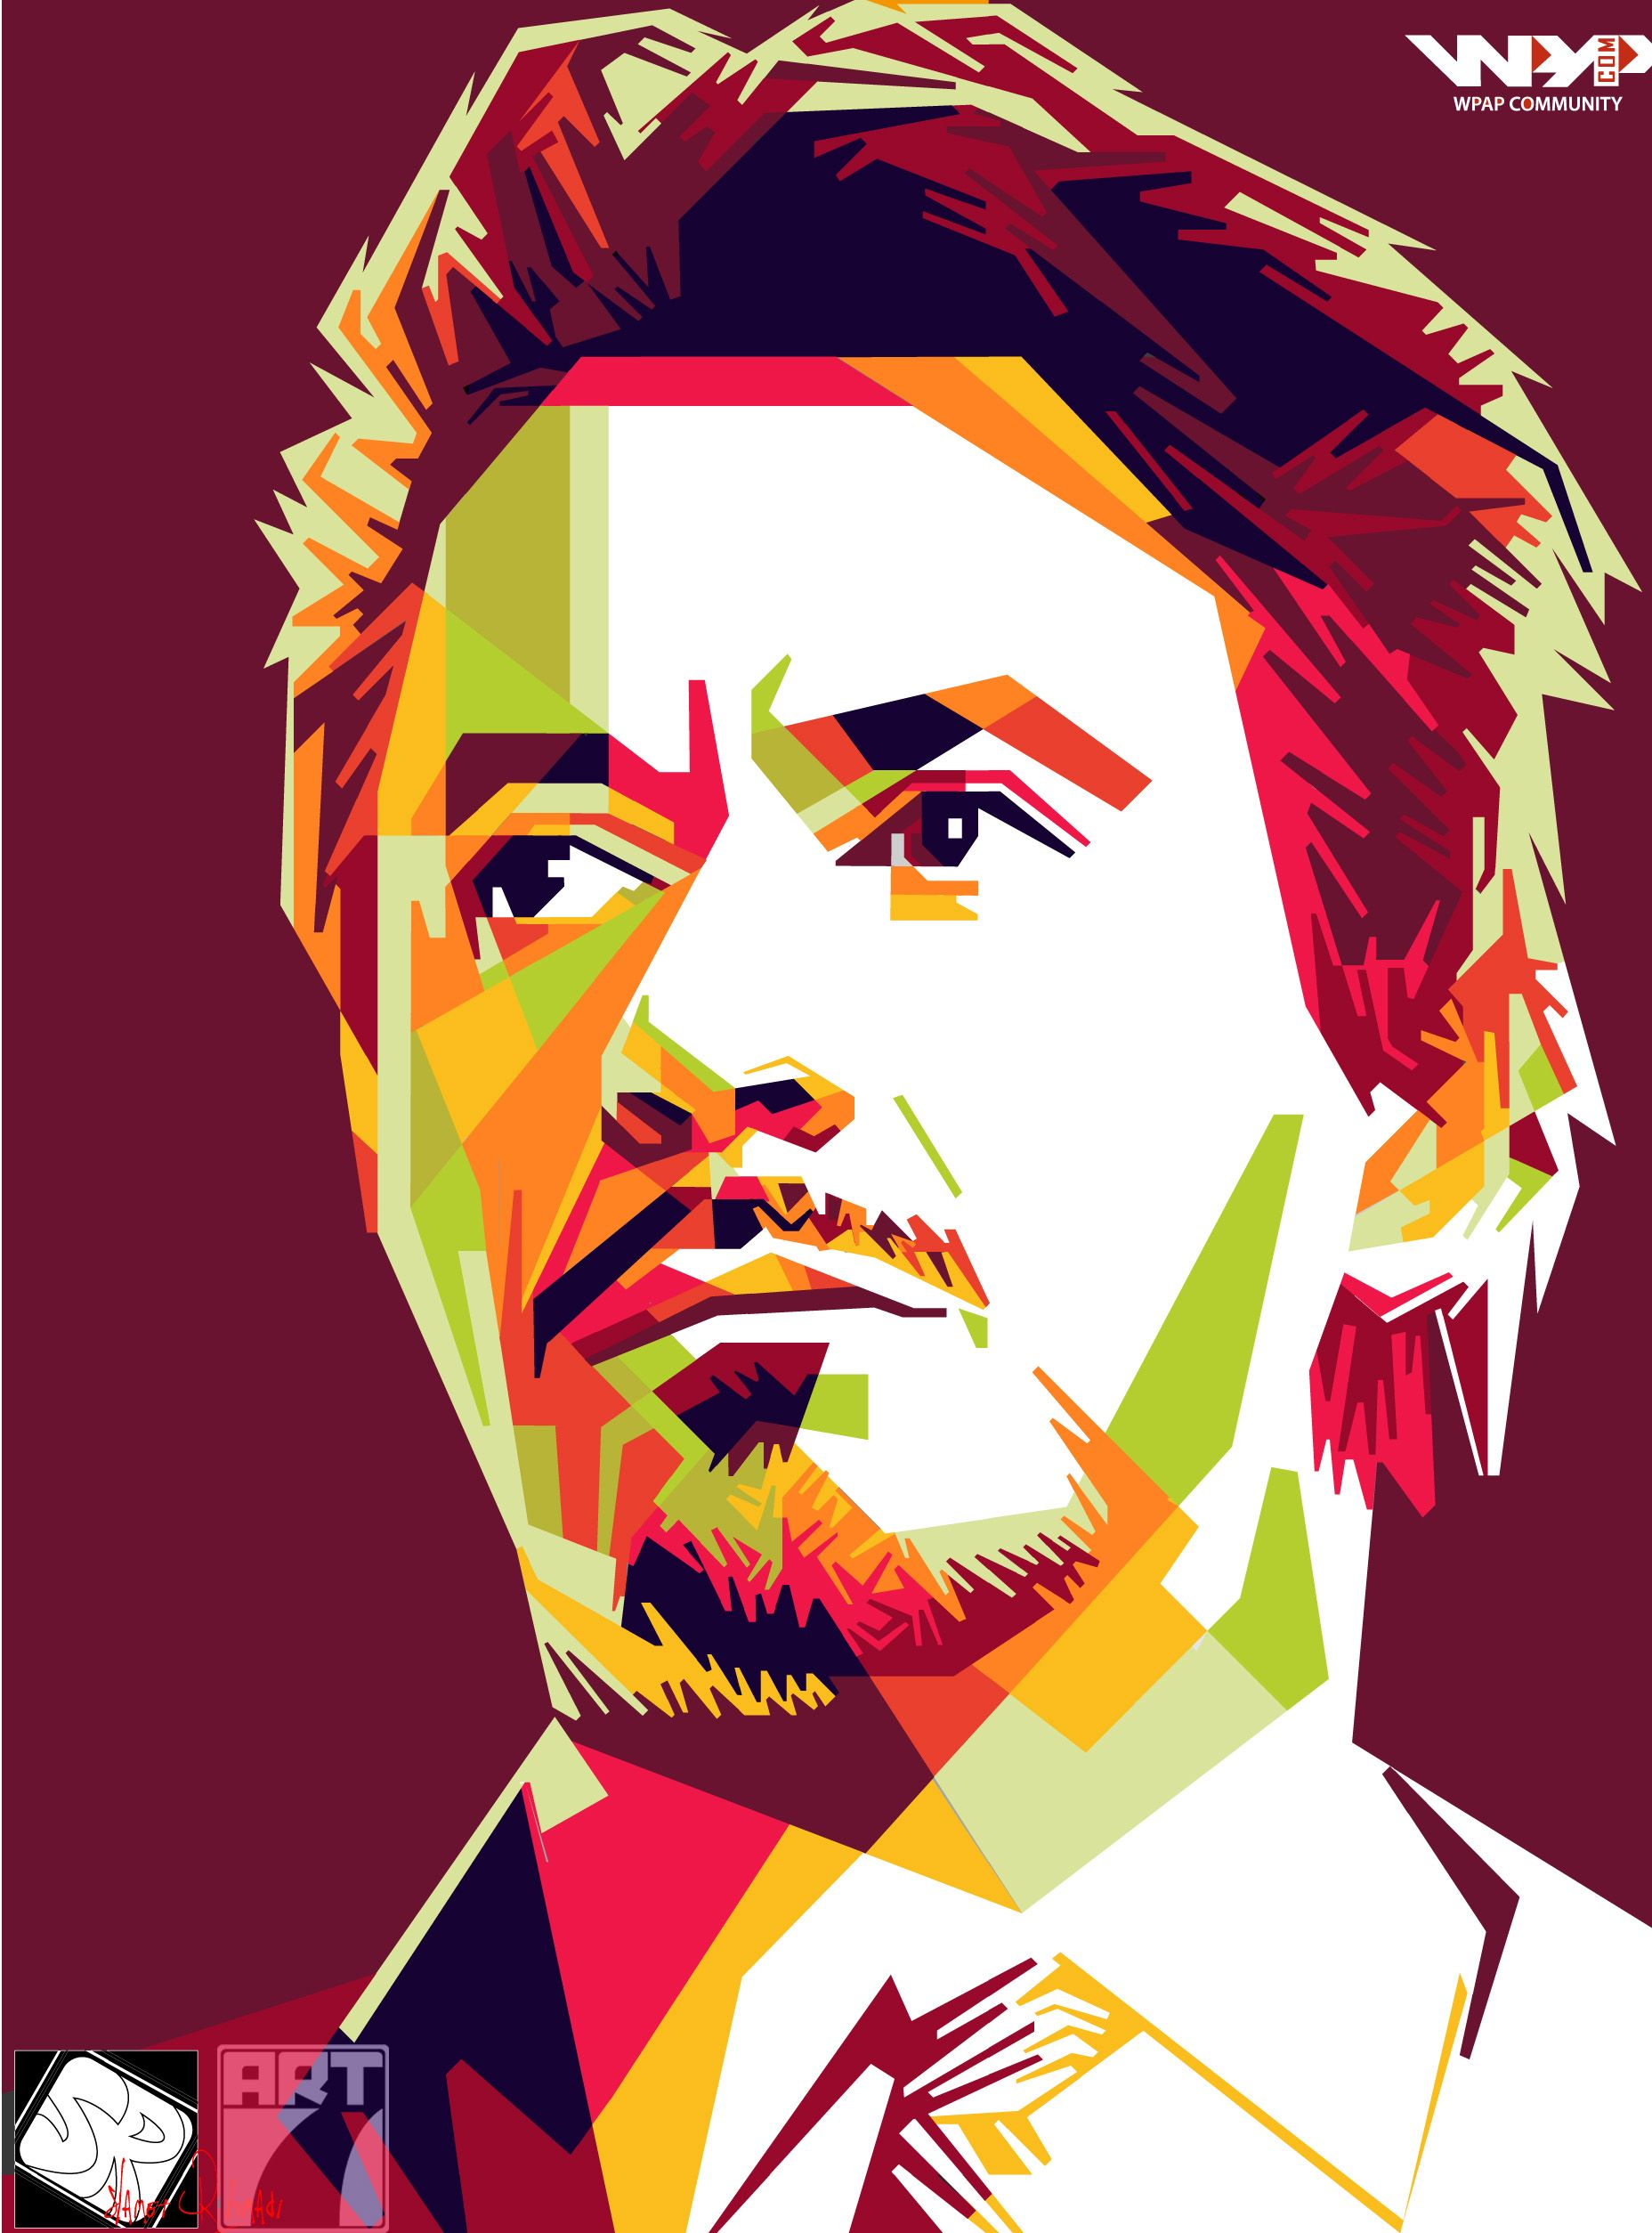 Tony Stark In Wpap Wpap Art Pop Art Painting Pop Art Portraits